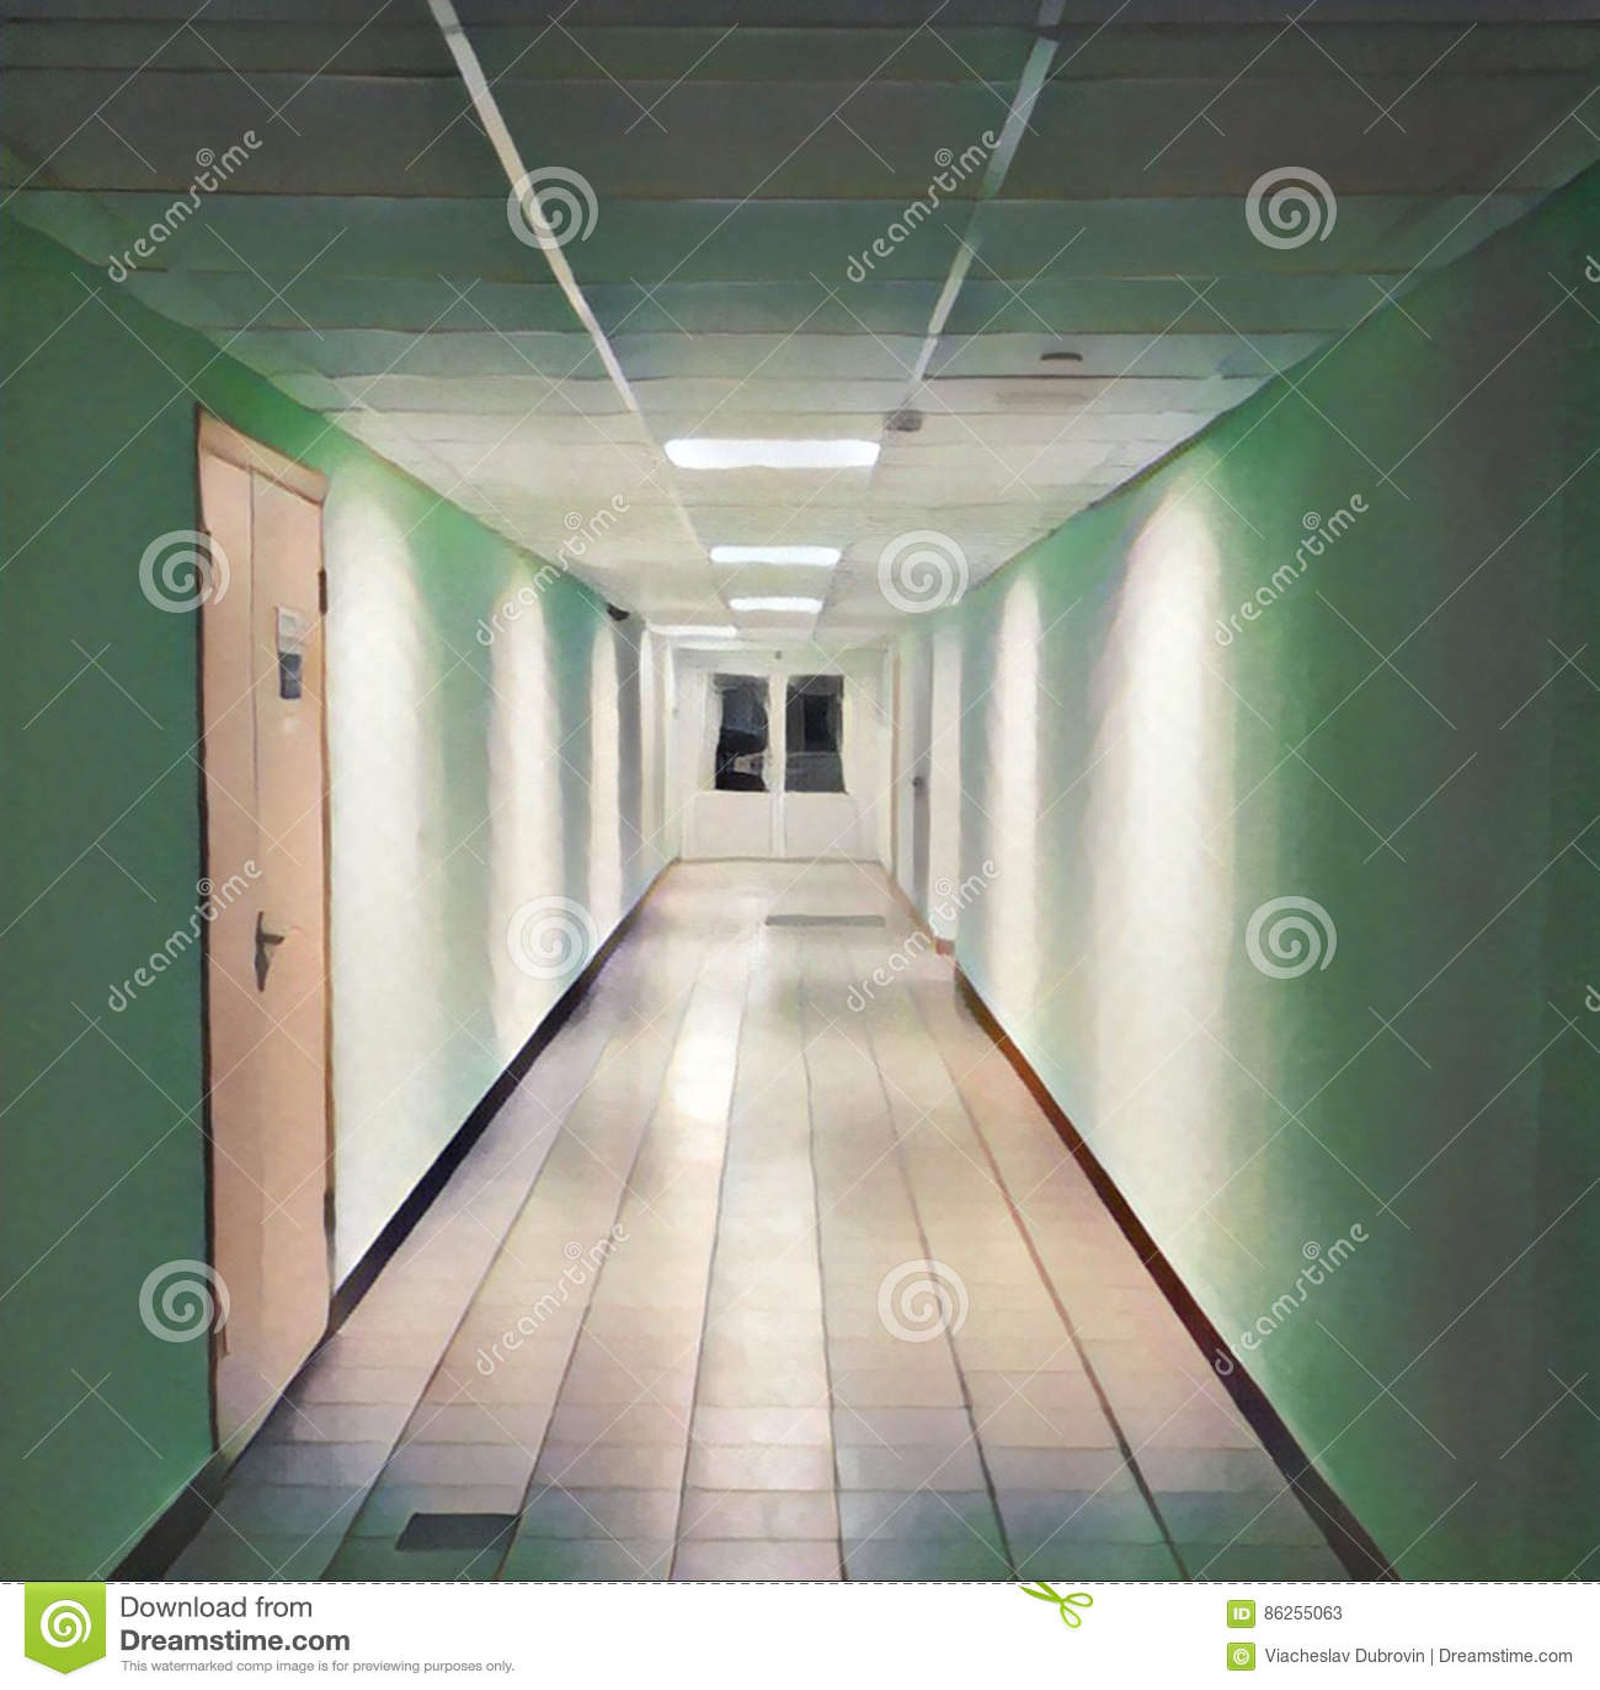 Clean Corridor Leading To Closed Doors. Digital ...